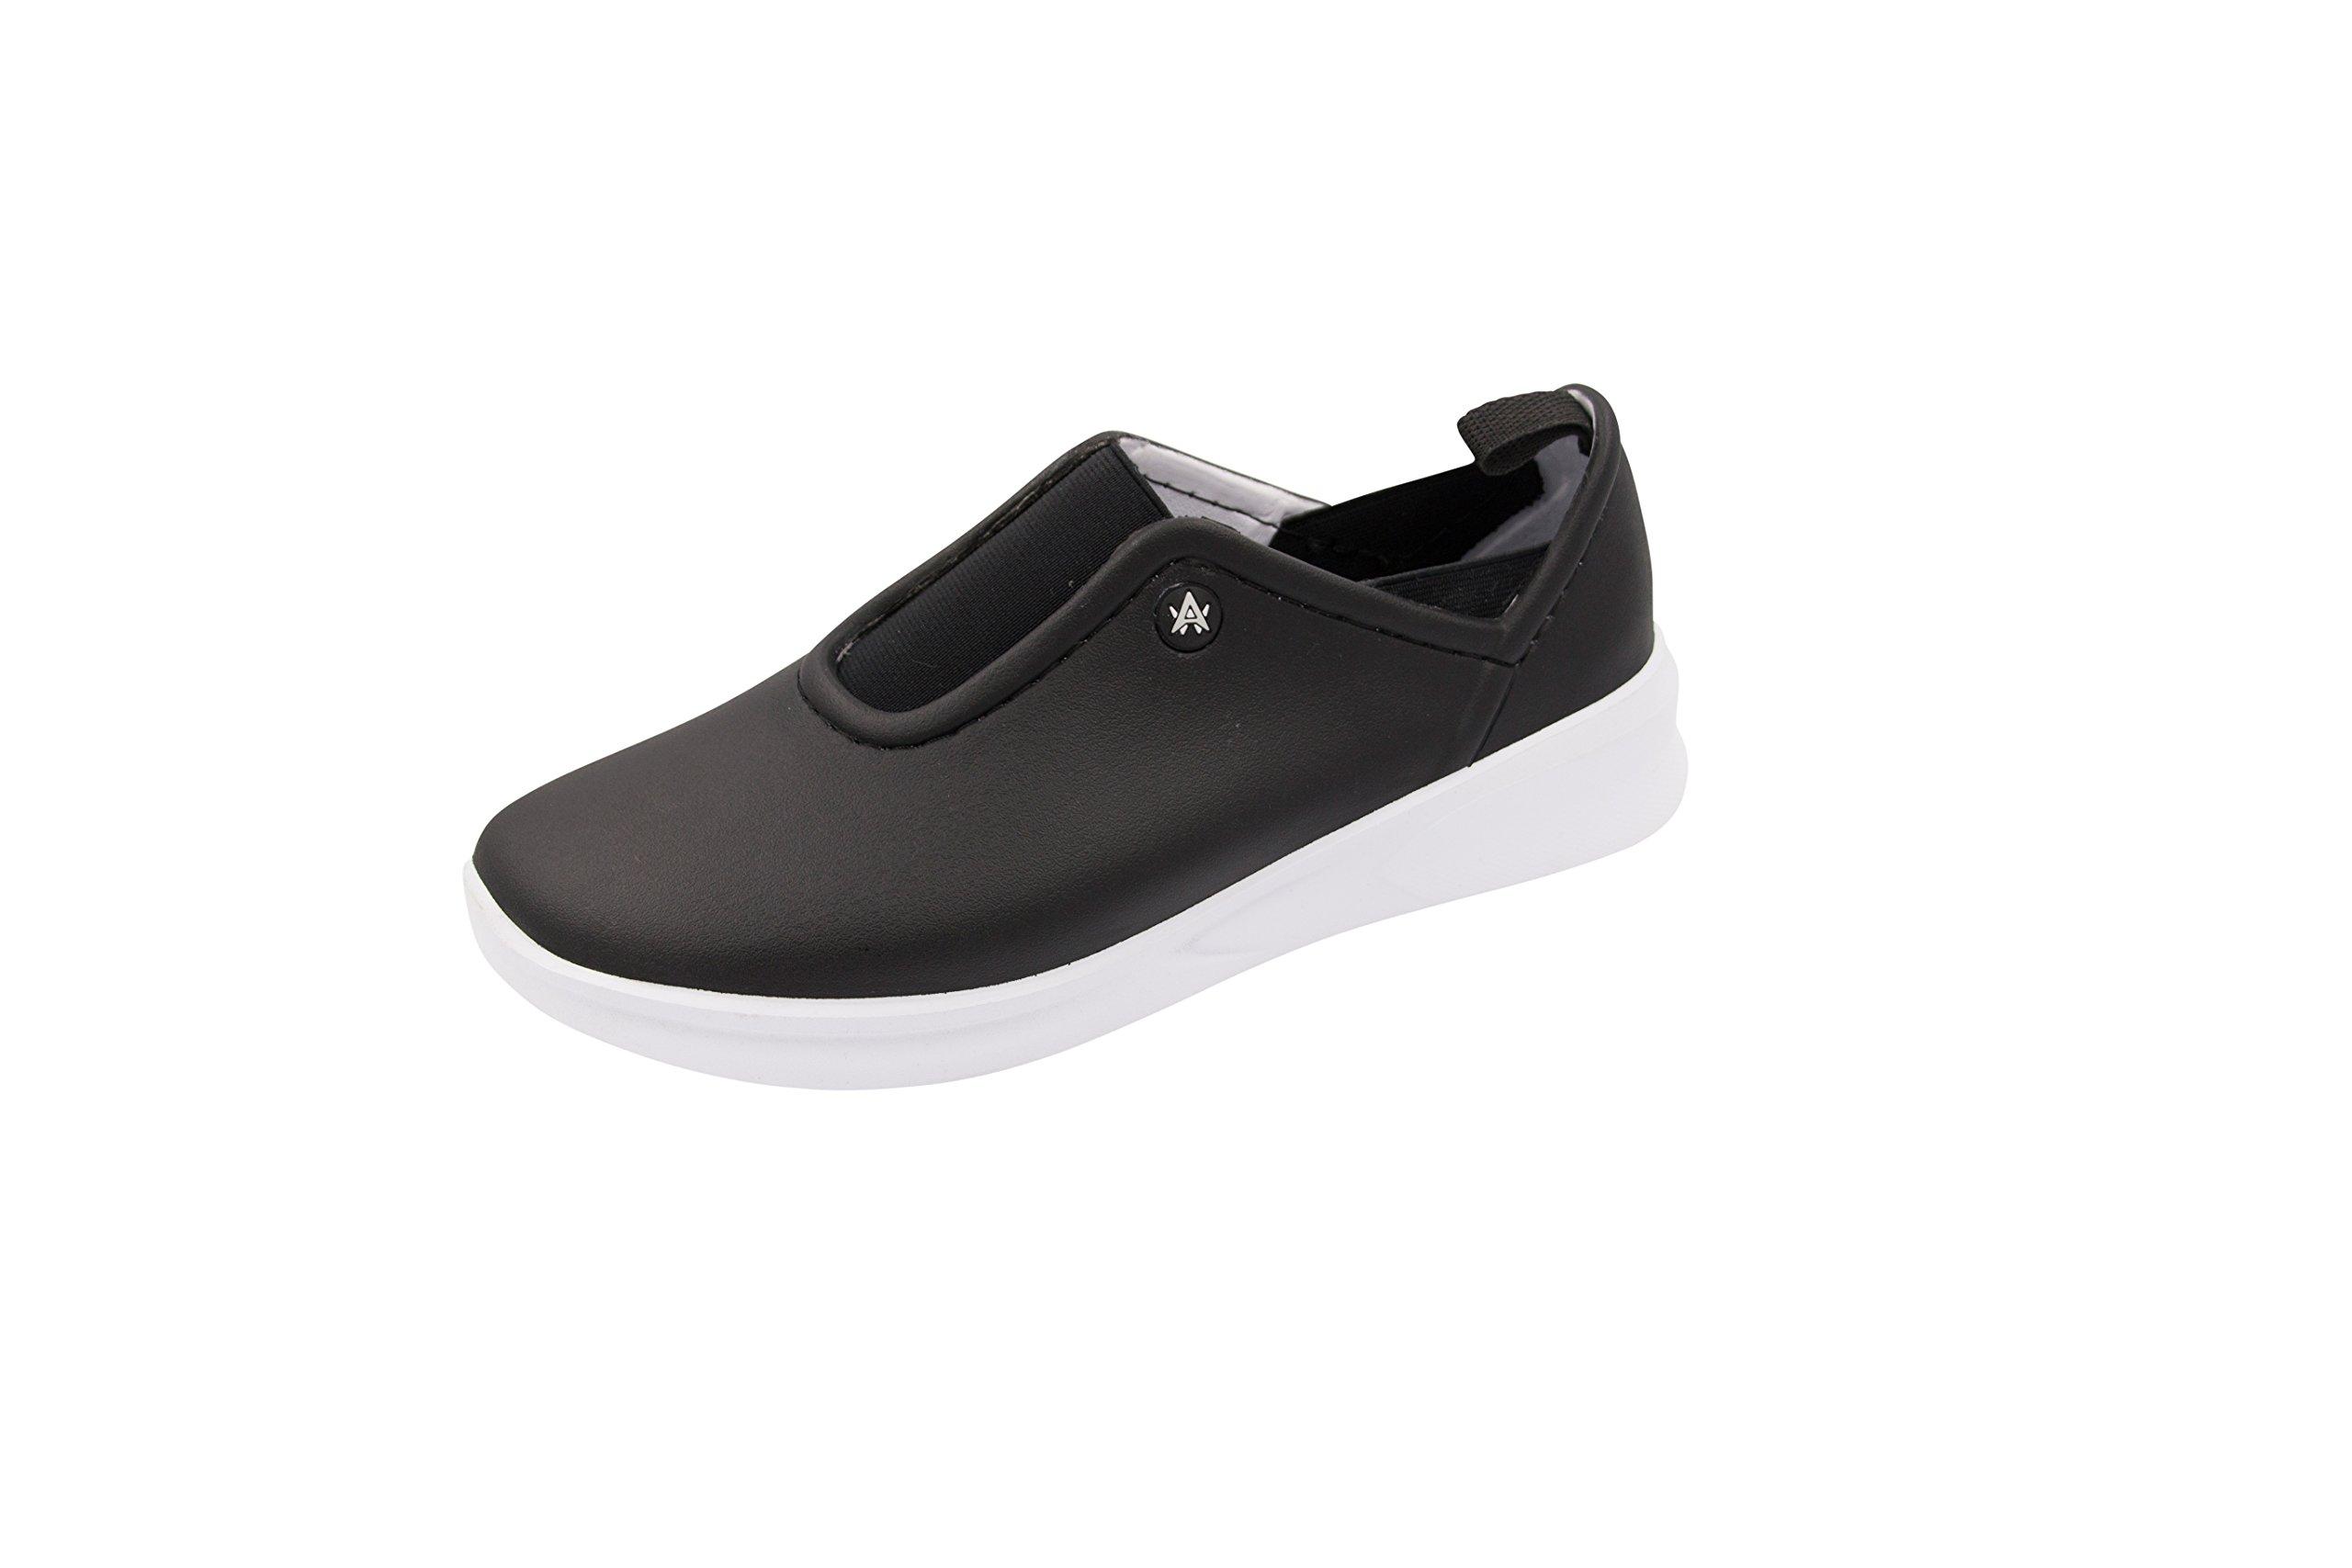 Anywear Women's Blaze Health Care Professional Shoe, Black/White, 8.0 Medium US